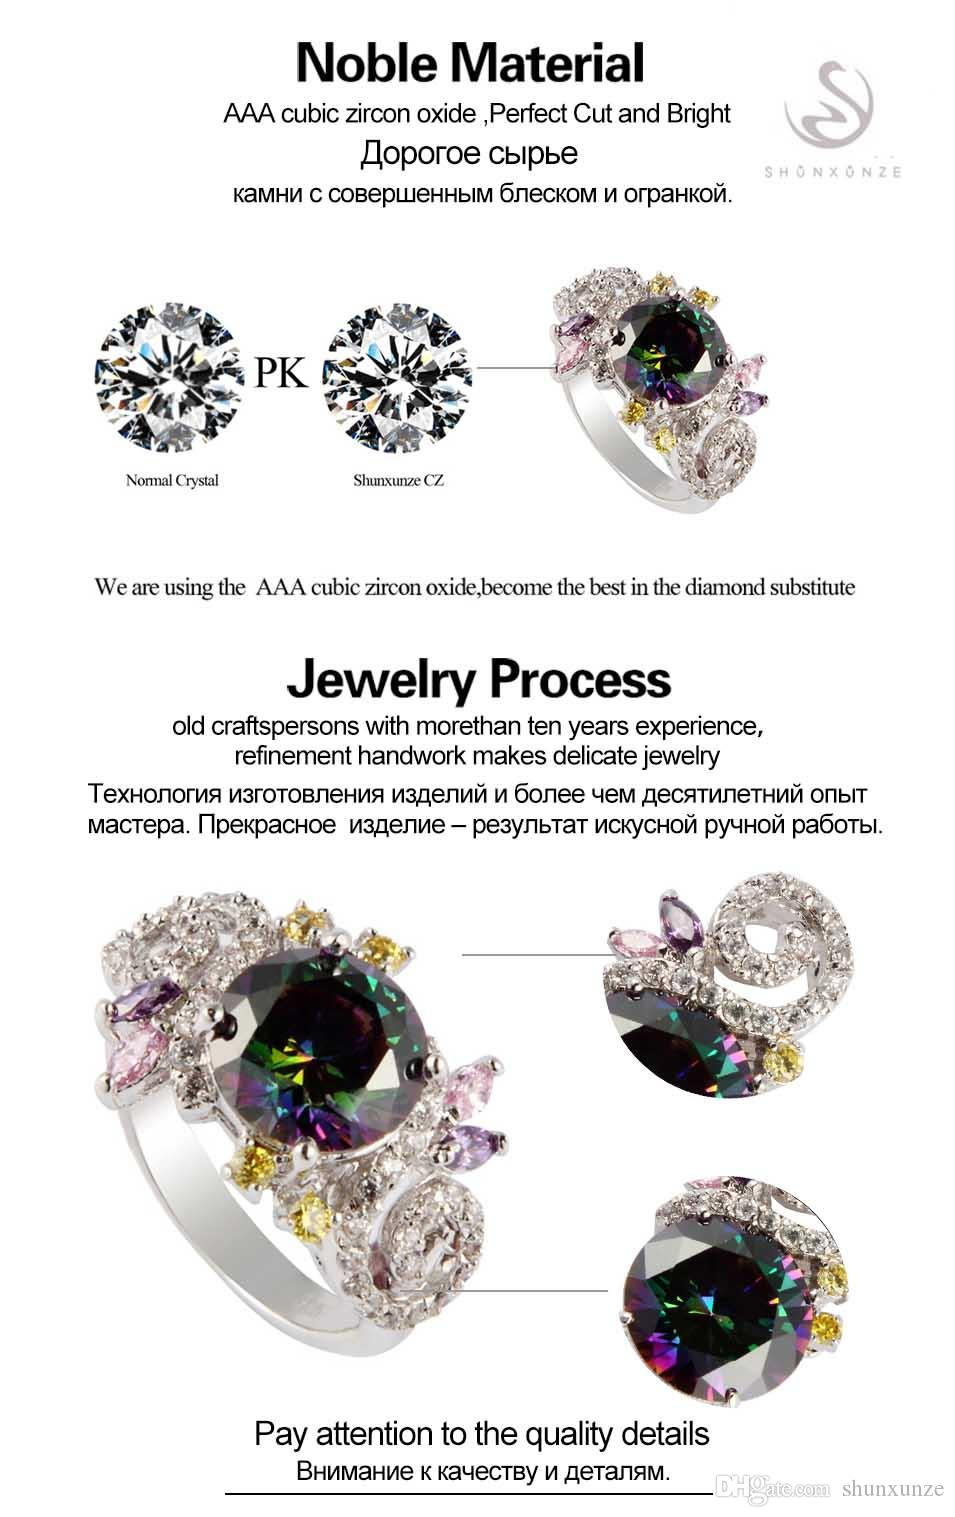 encantos SHUNXUNZE produtos de primeira classe Anéis de casamento Jóias e Acessórios para as mulheres dropshipping do arco-íris Cubic Zirconia ródio R707G